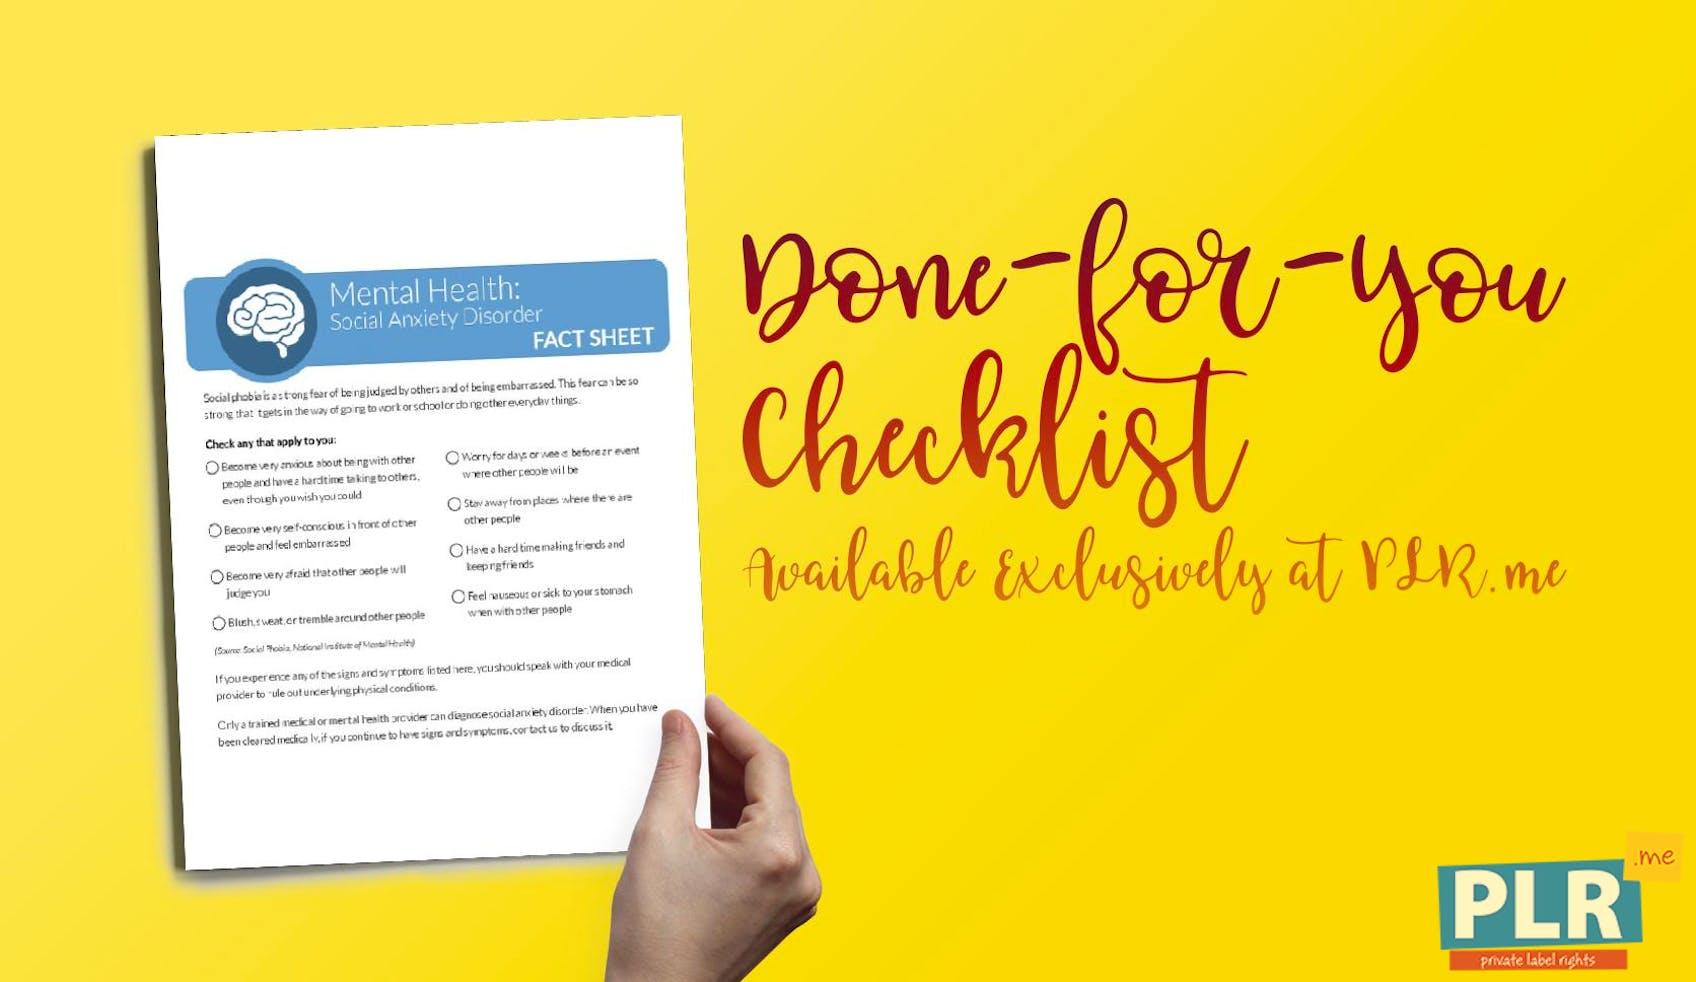 Mental Health Social Anxiety Disorder Checklist